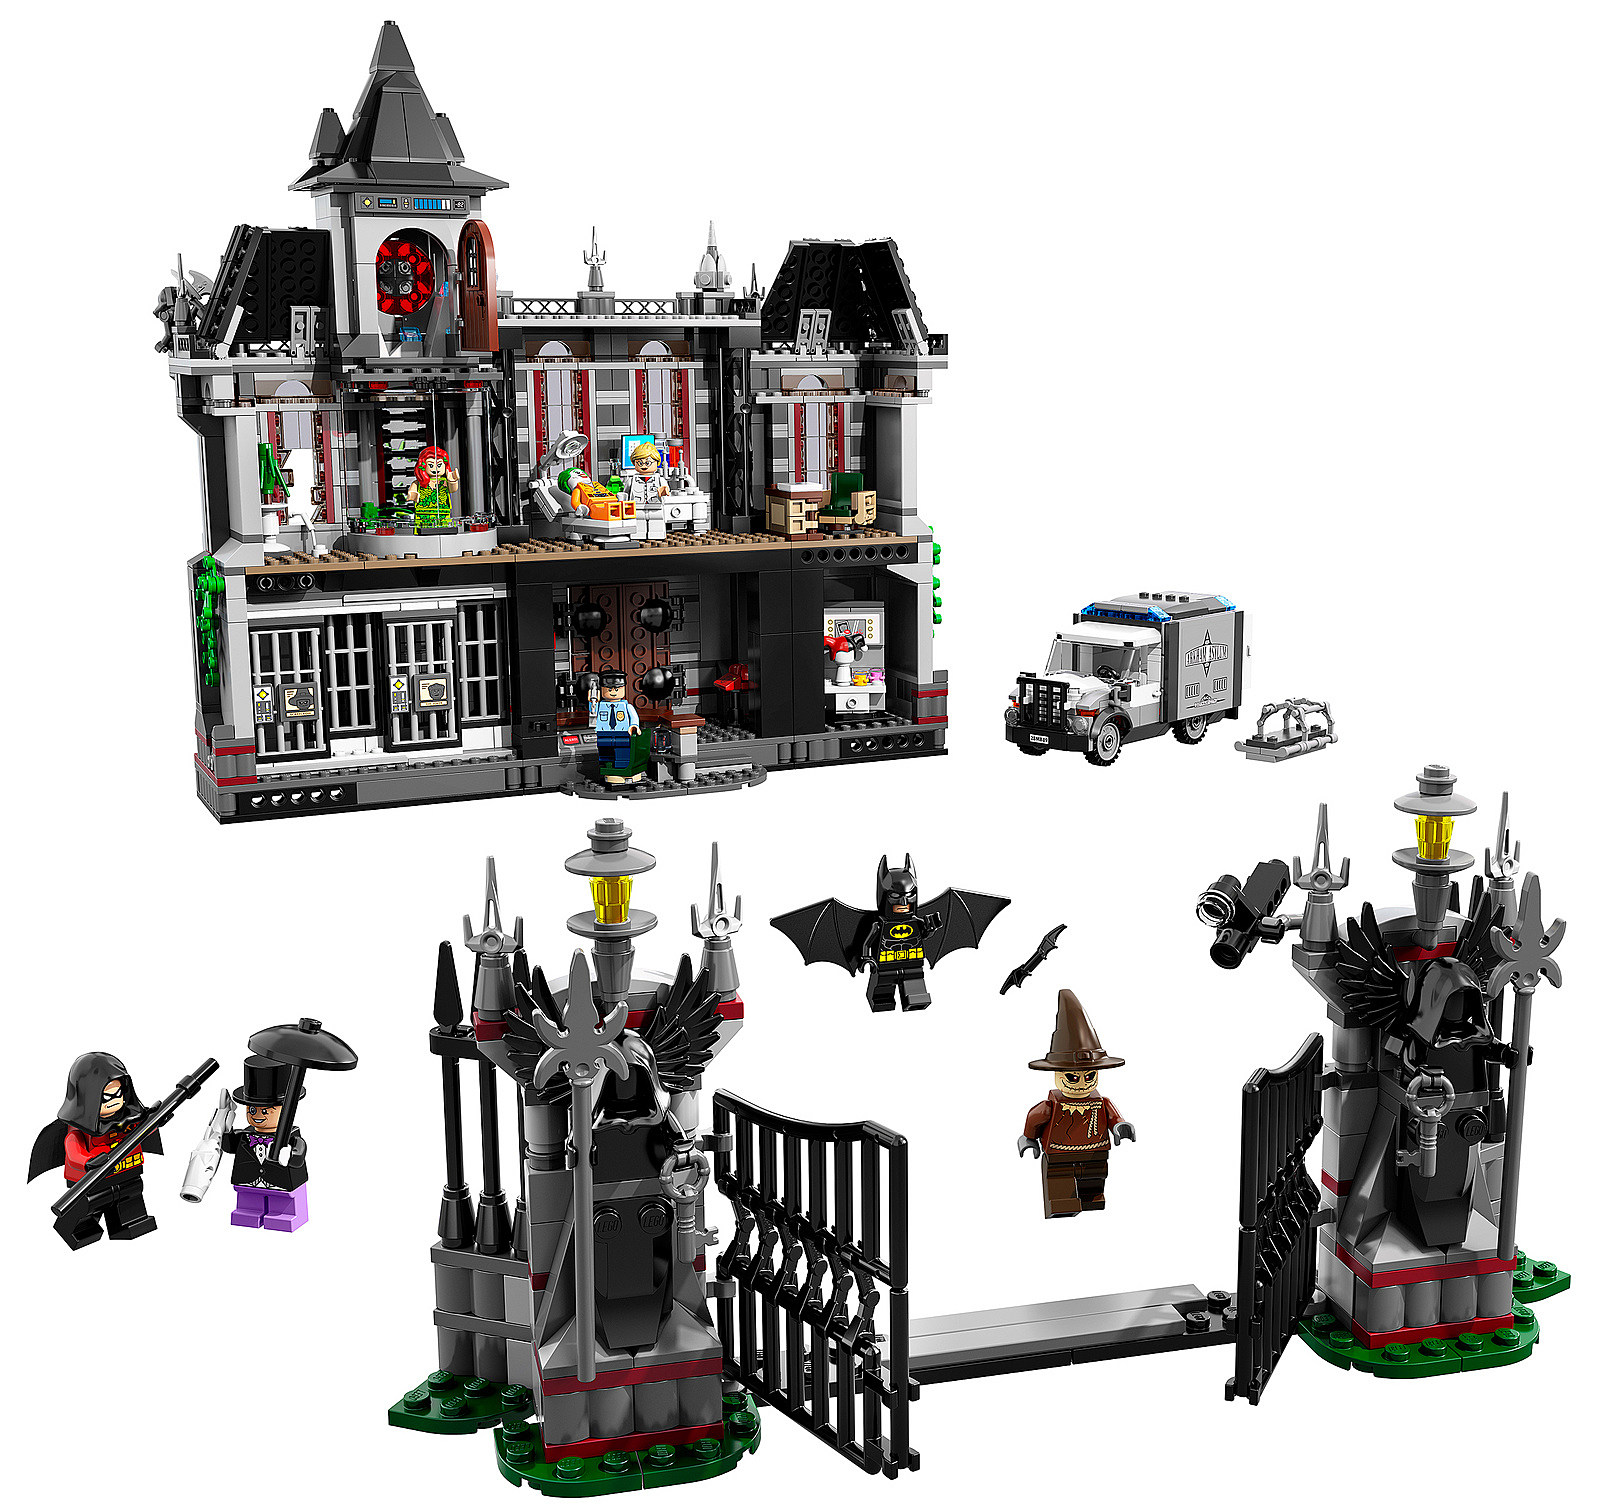 Lego Batman Arkham Knight: Massive New Lego Arkham Asylum Set Announced